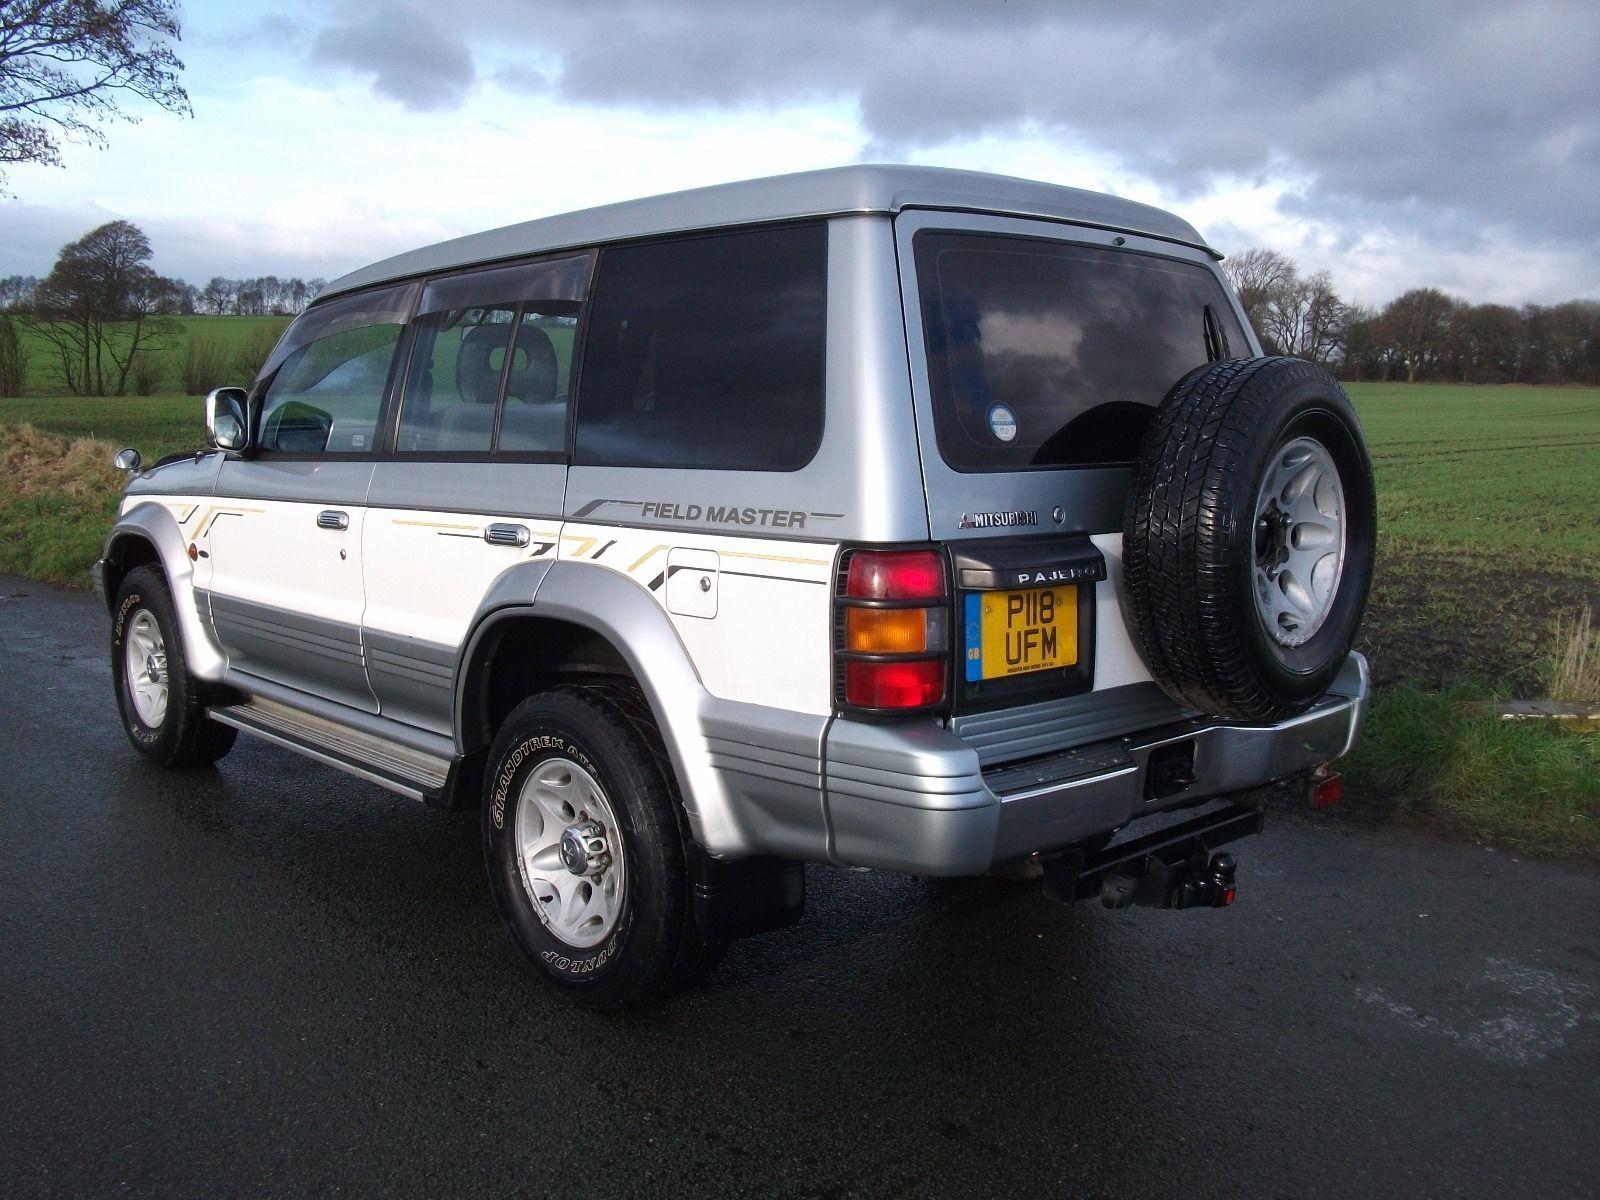 1997 mitsubishi pajero fieldmaster 2.8td silver/white   Mitsubishi